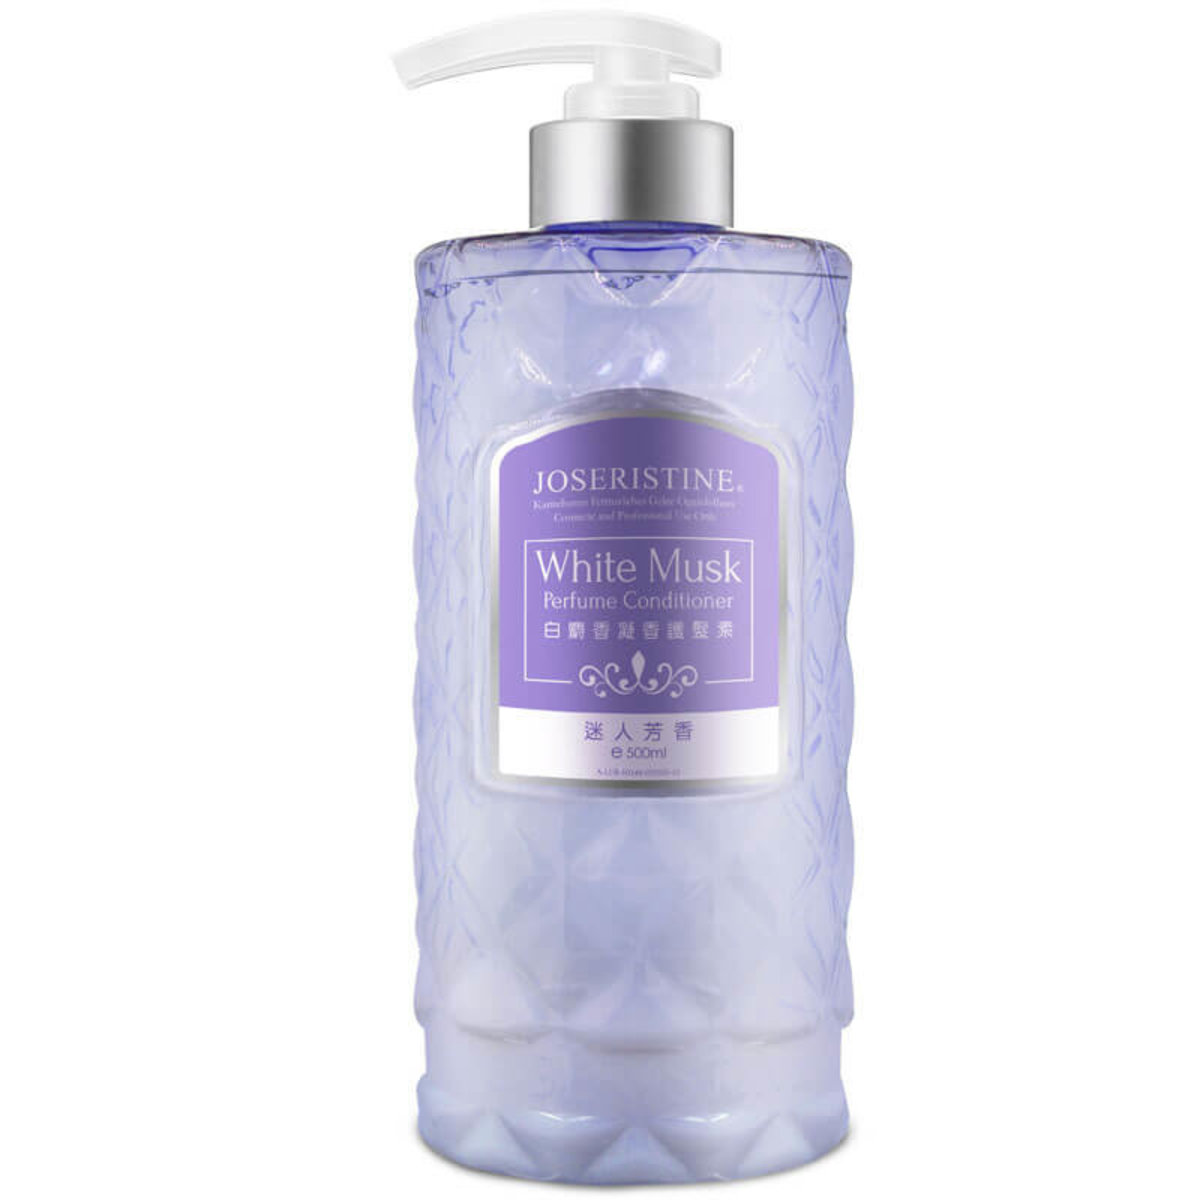 White Musk Perfume Conditioner